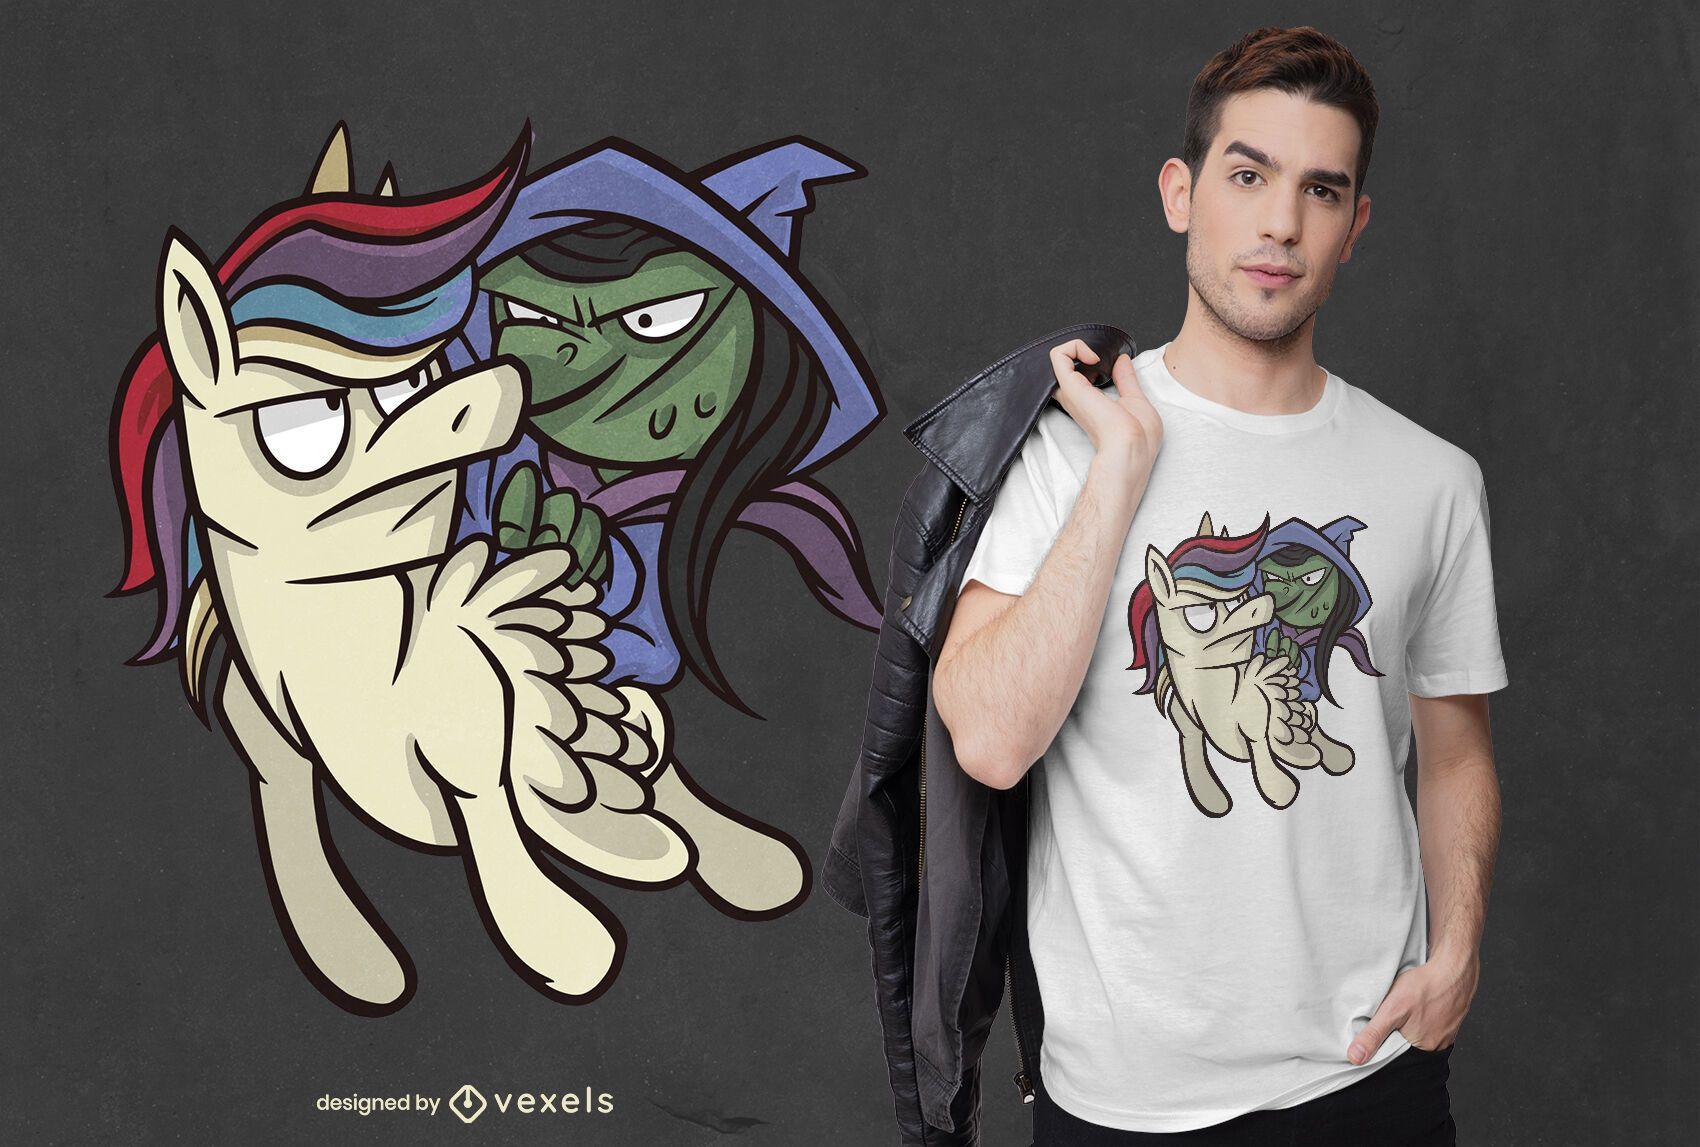 Witch & unicorn t-shirt design